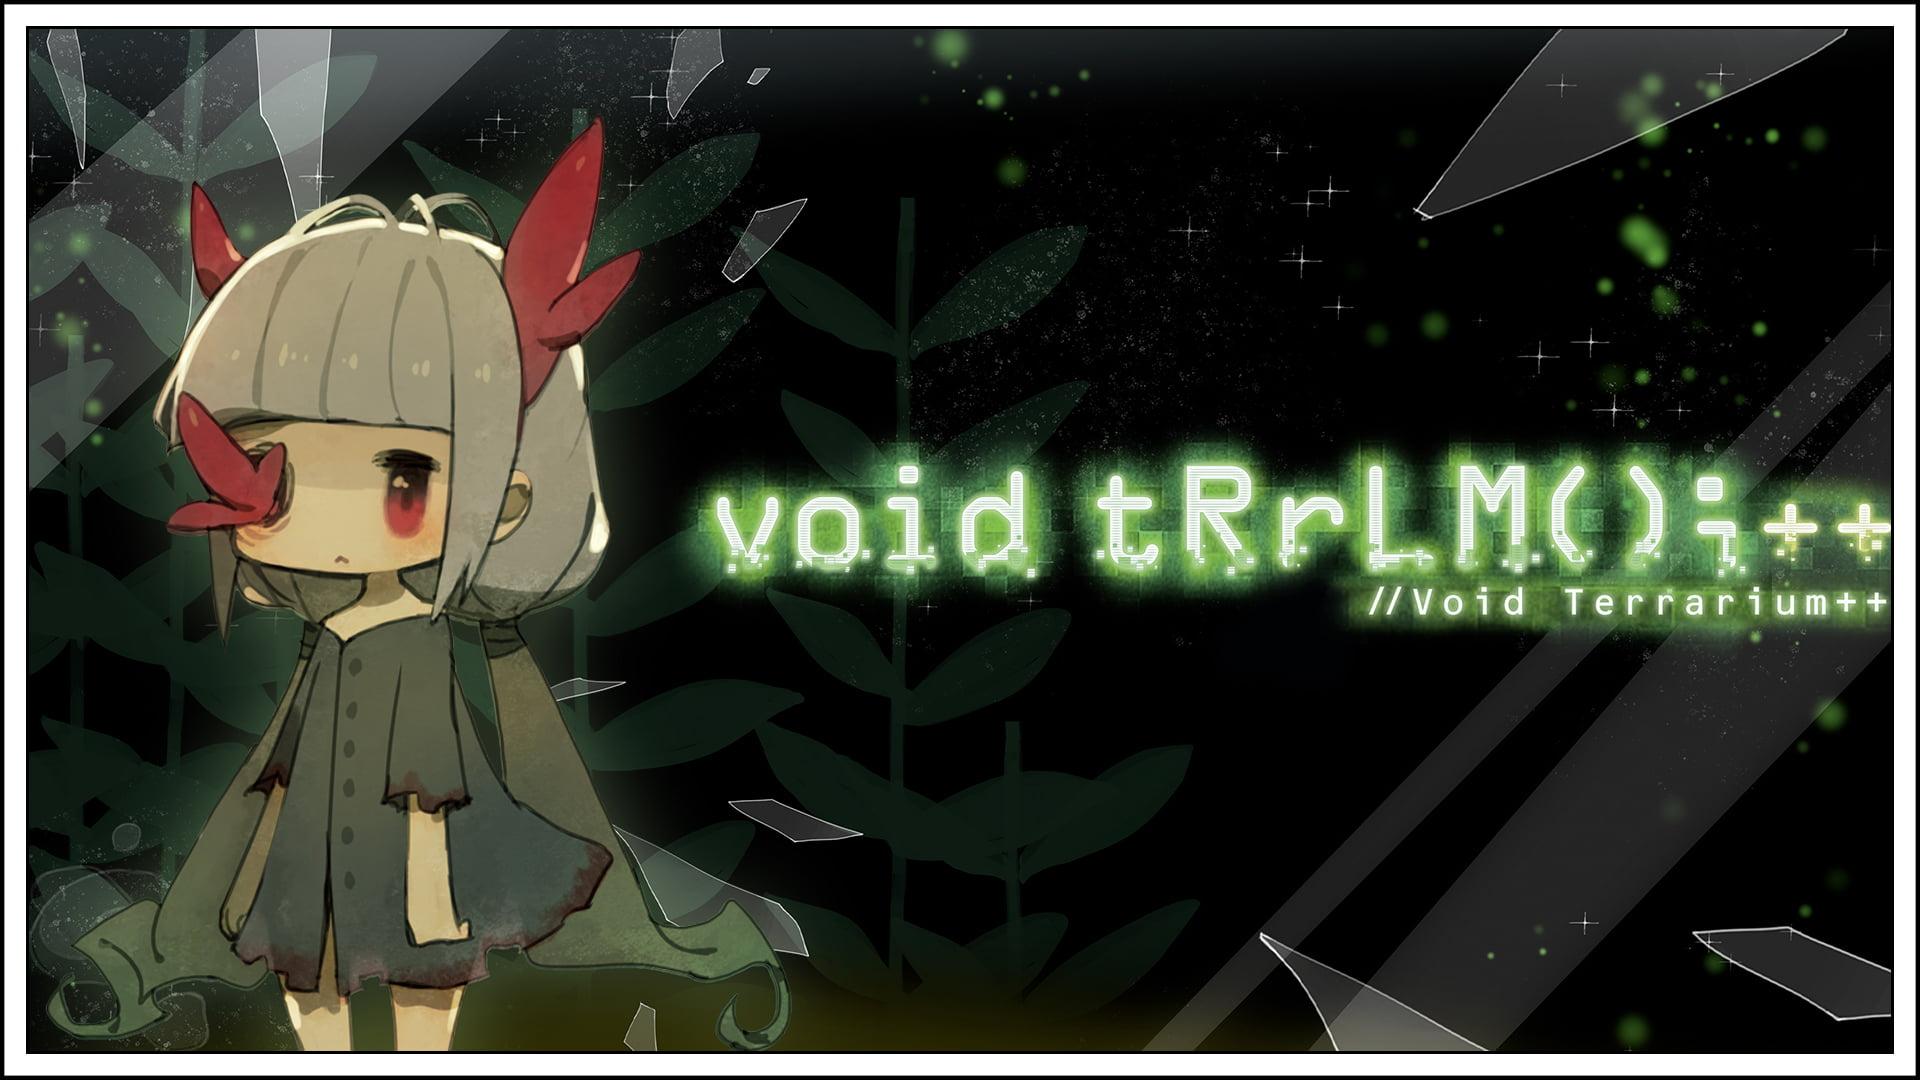 void tRrLM();++ //Void Terrarium++ (PS5) Review